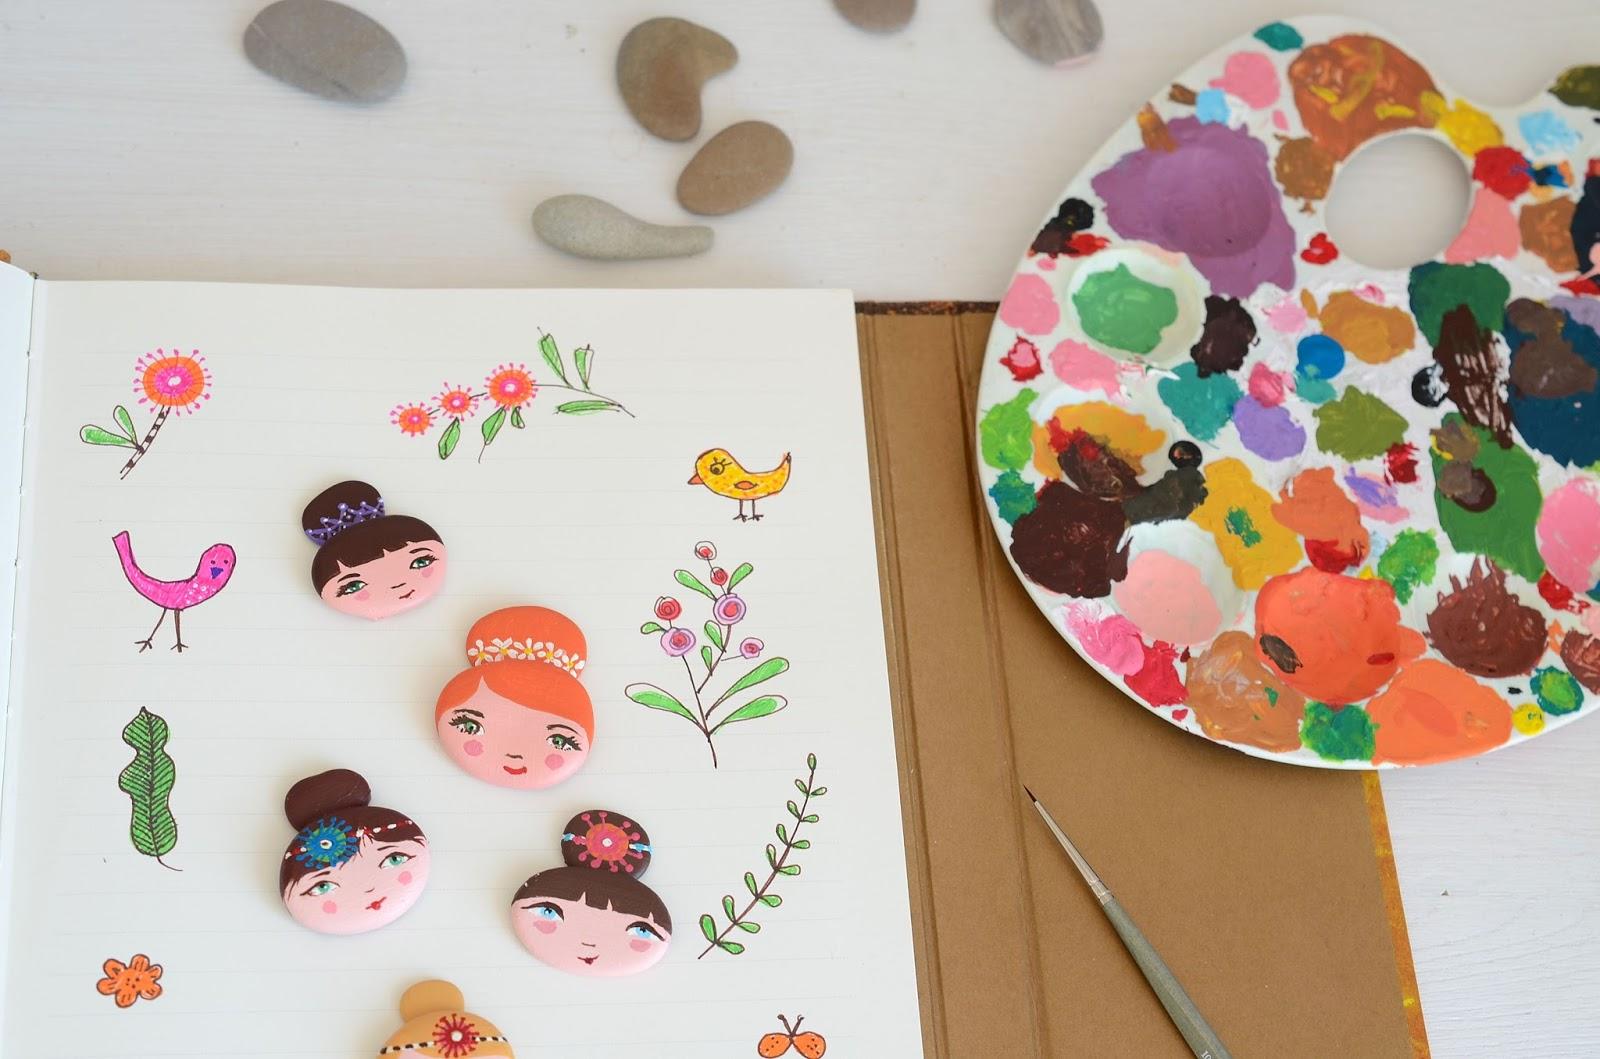 Dipingere Sassi Per Natale linfa creativa: i miei sassi dipinti